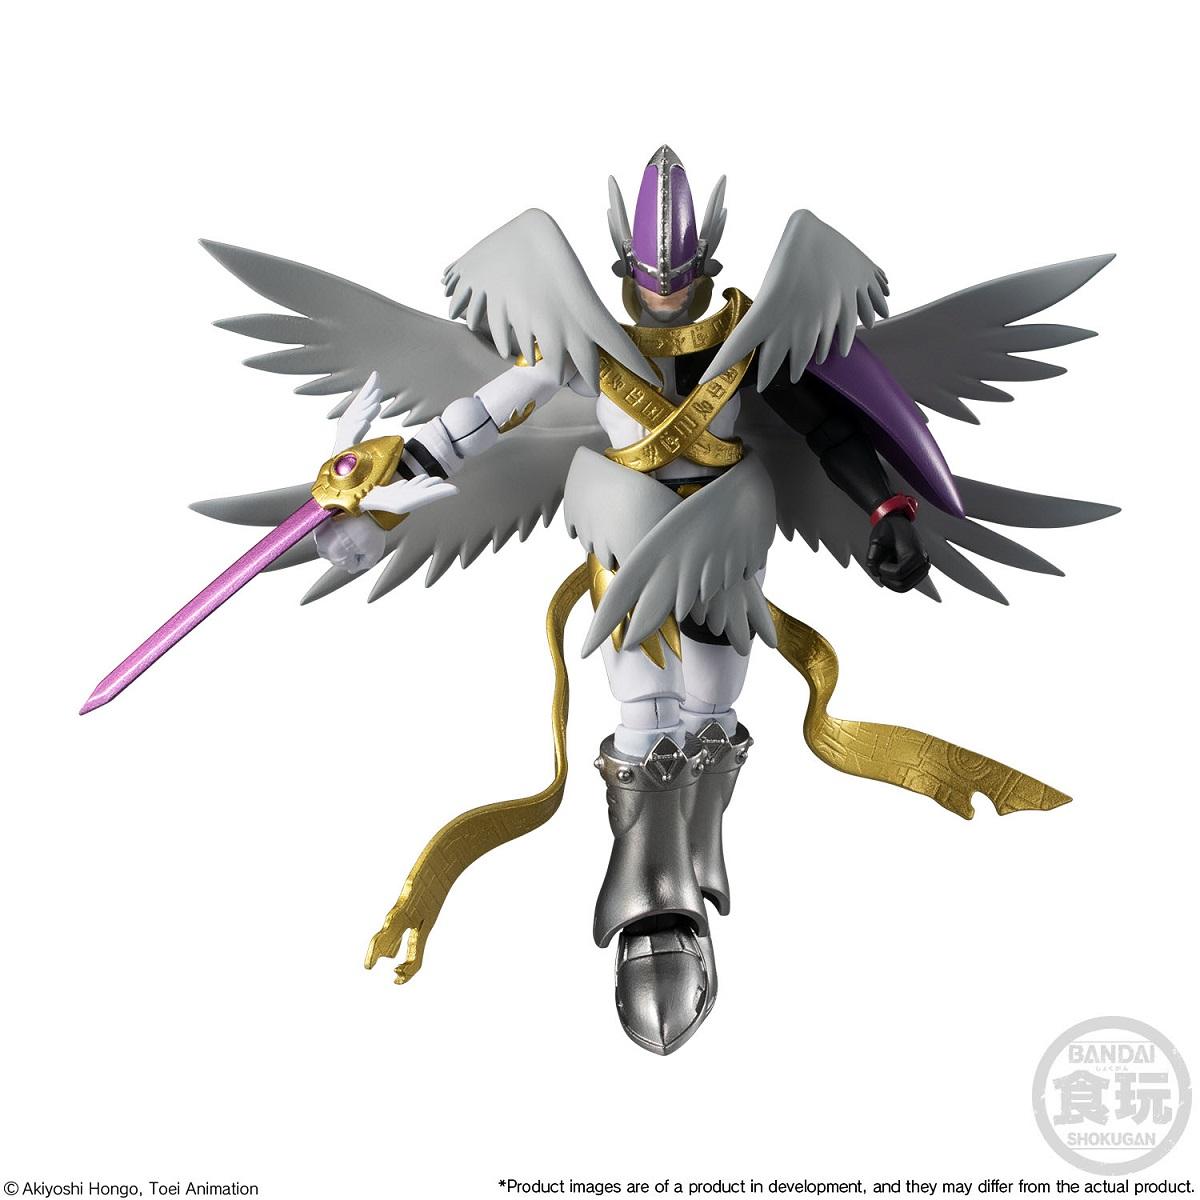 Shodo Digimon Adventure 2 Digimon Figure Blind Box